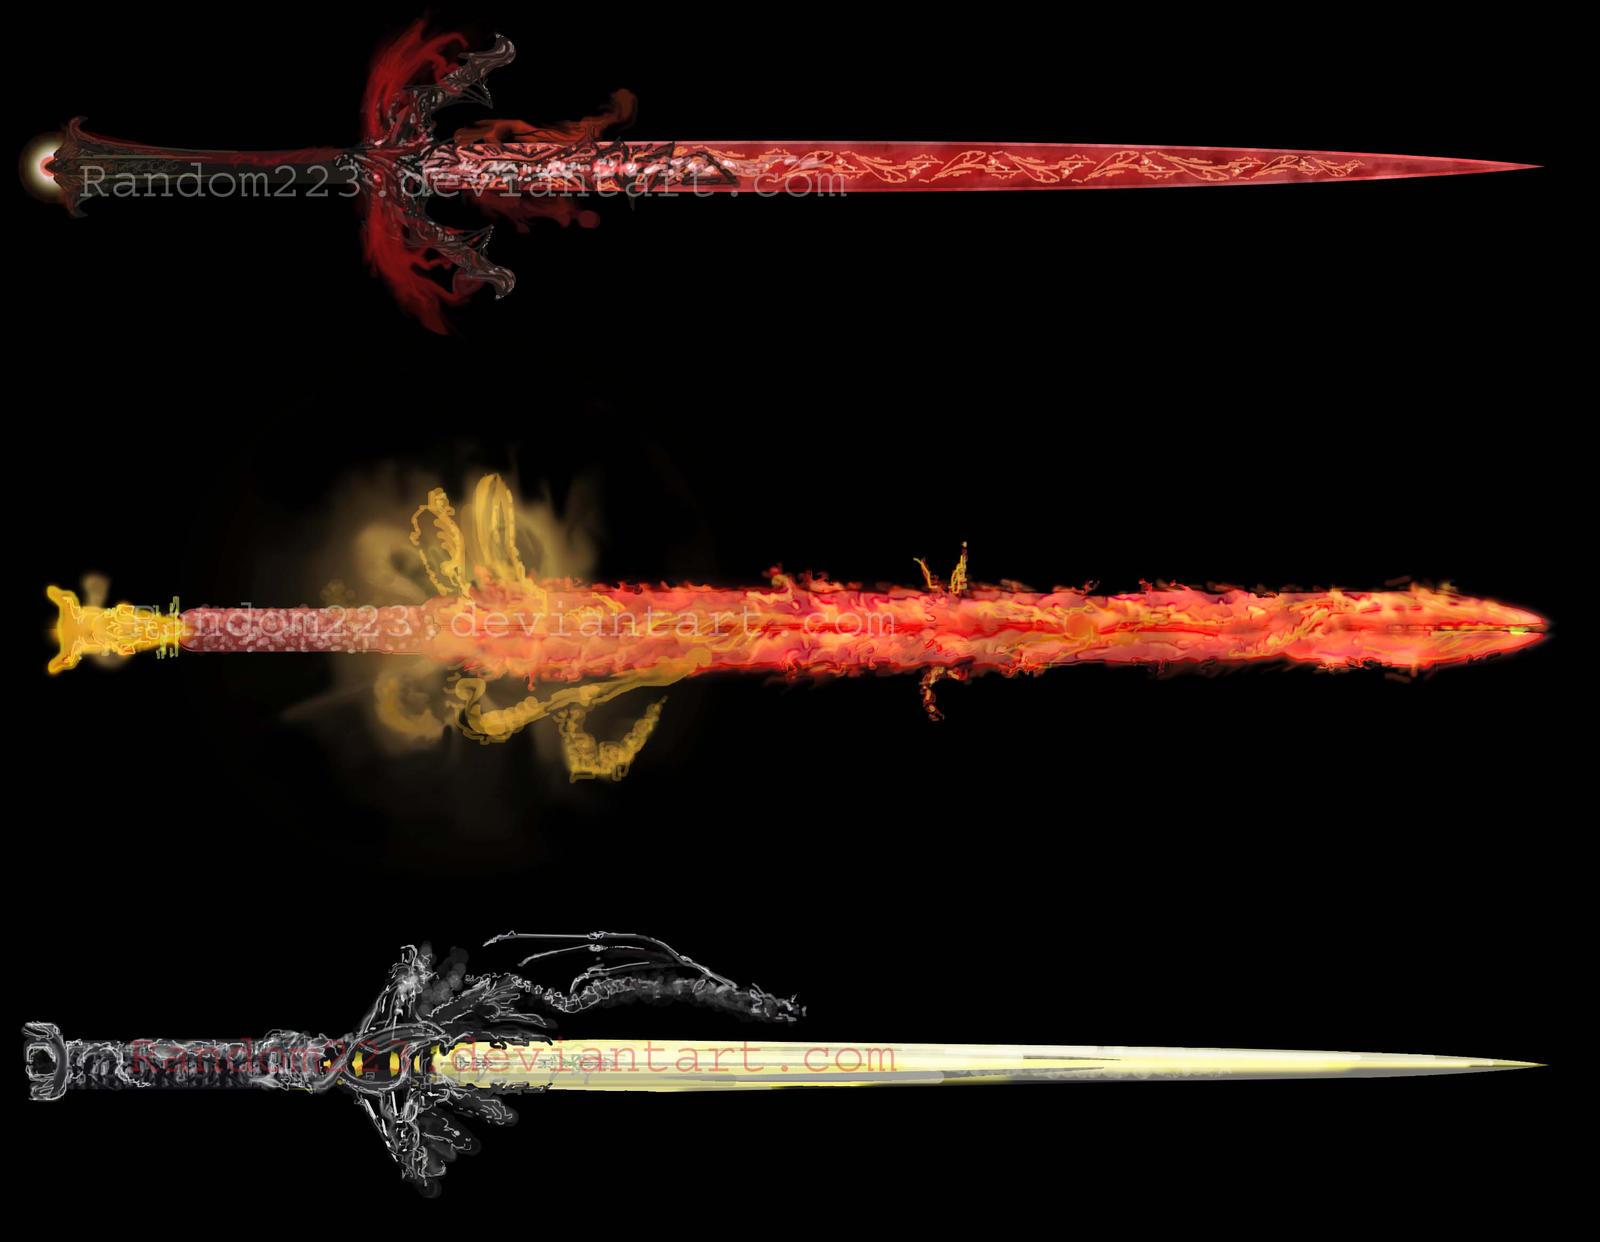 Weaponry 325 by Random223